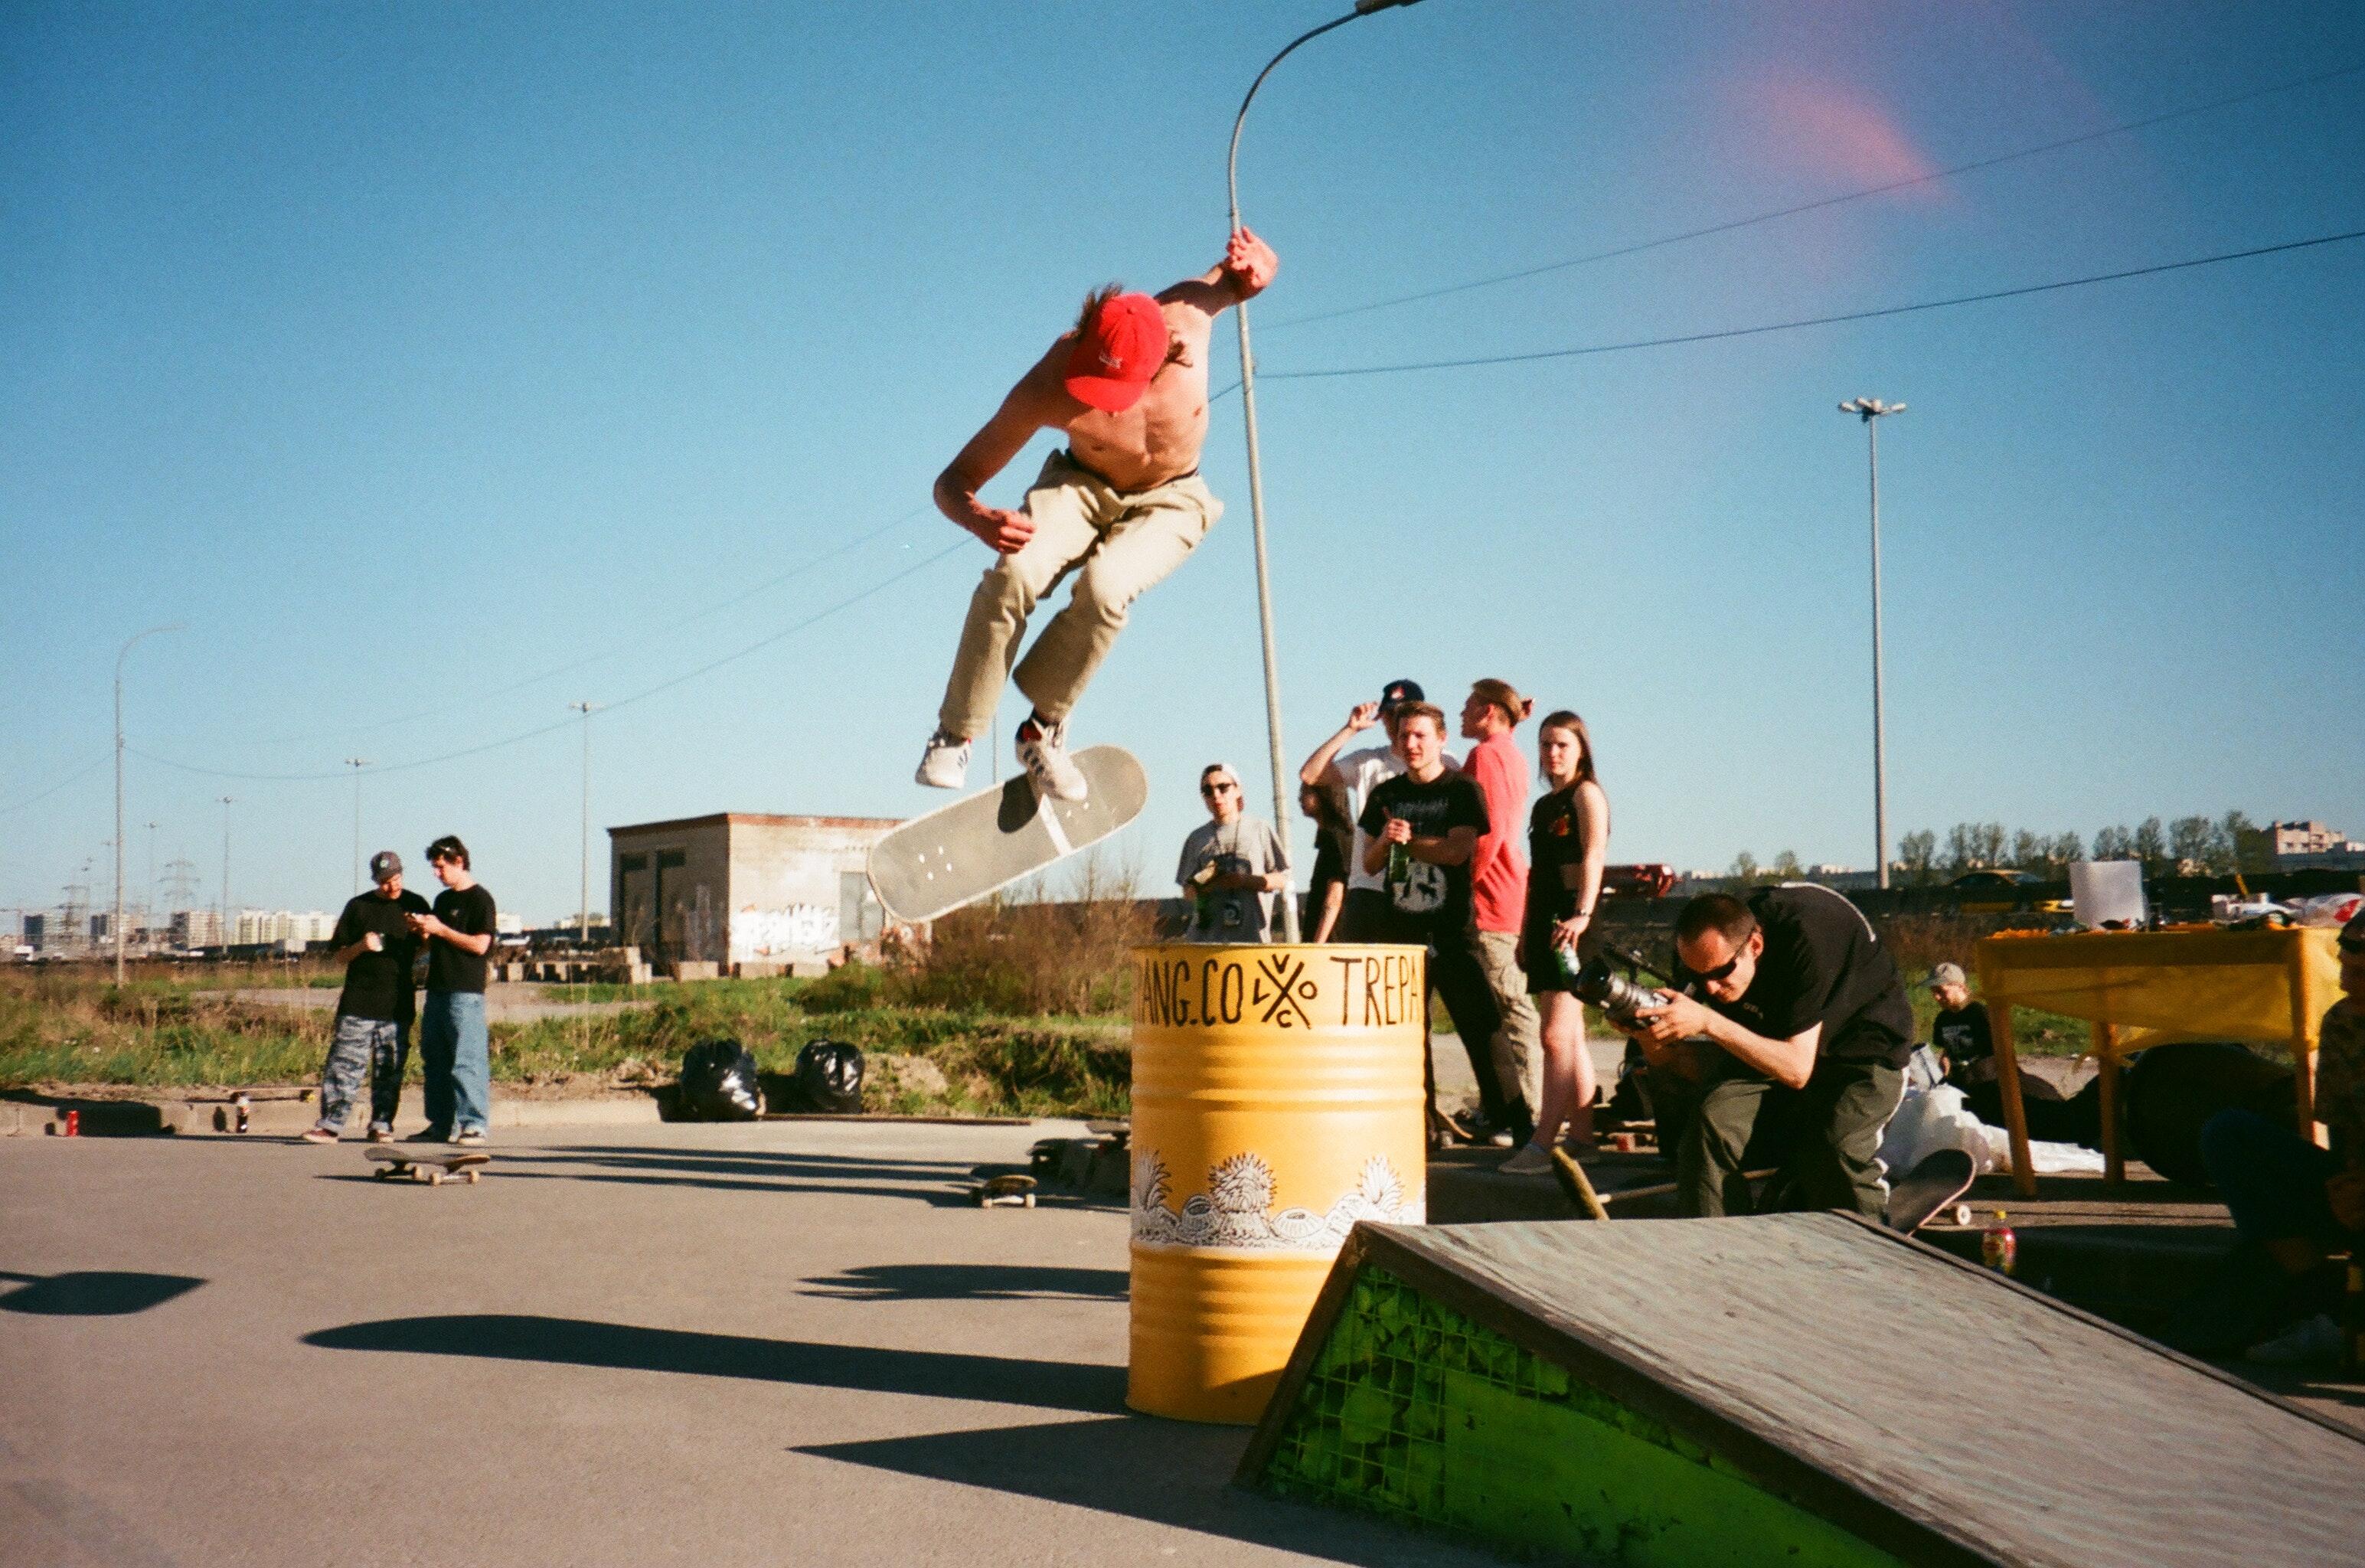 boy skateboarding grayscale photography  u00b7 free stock photo